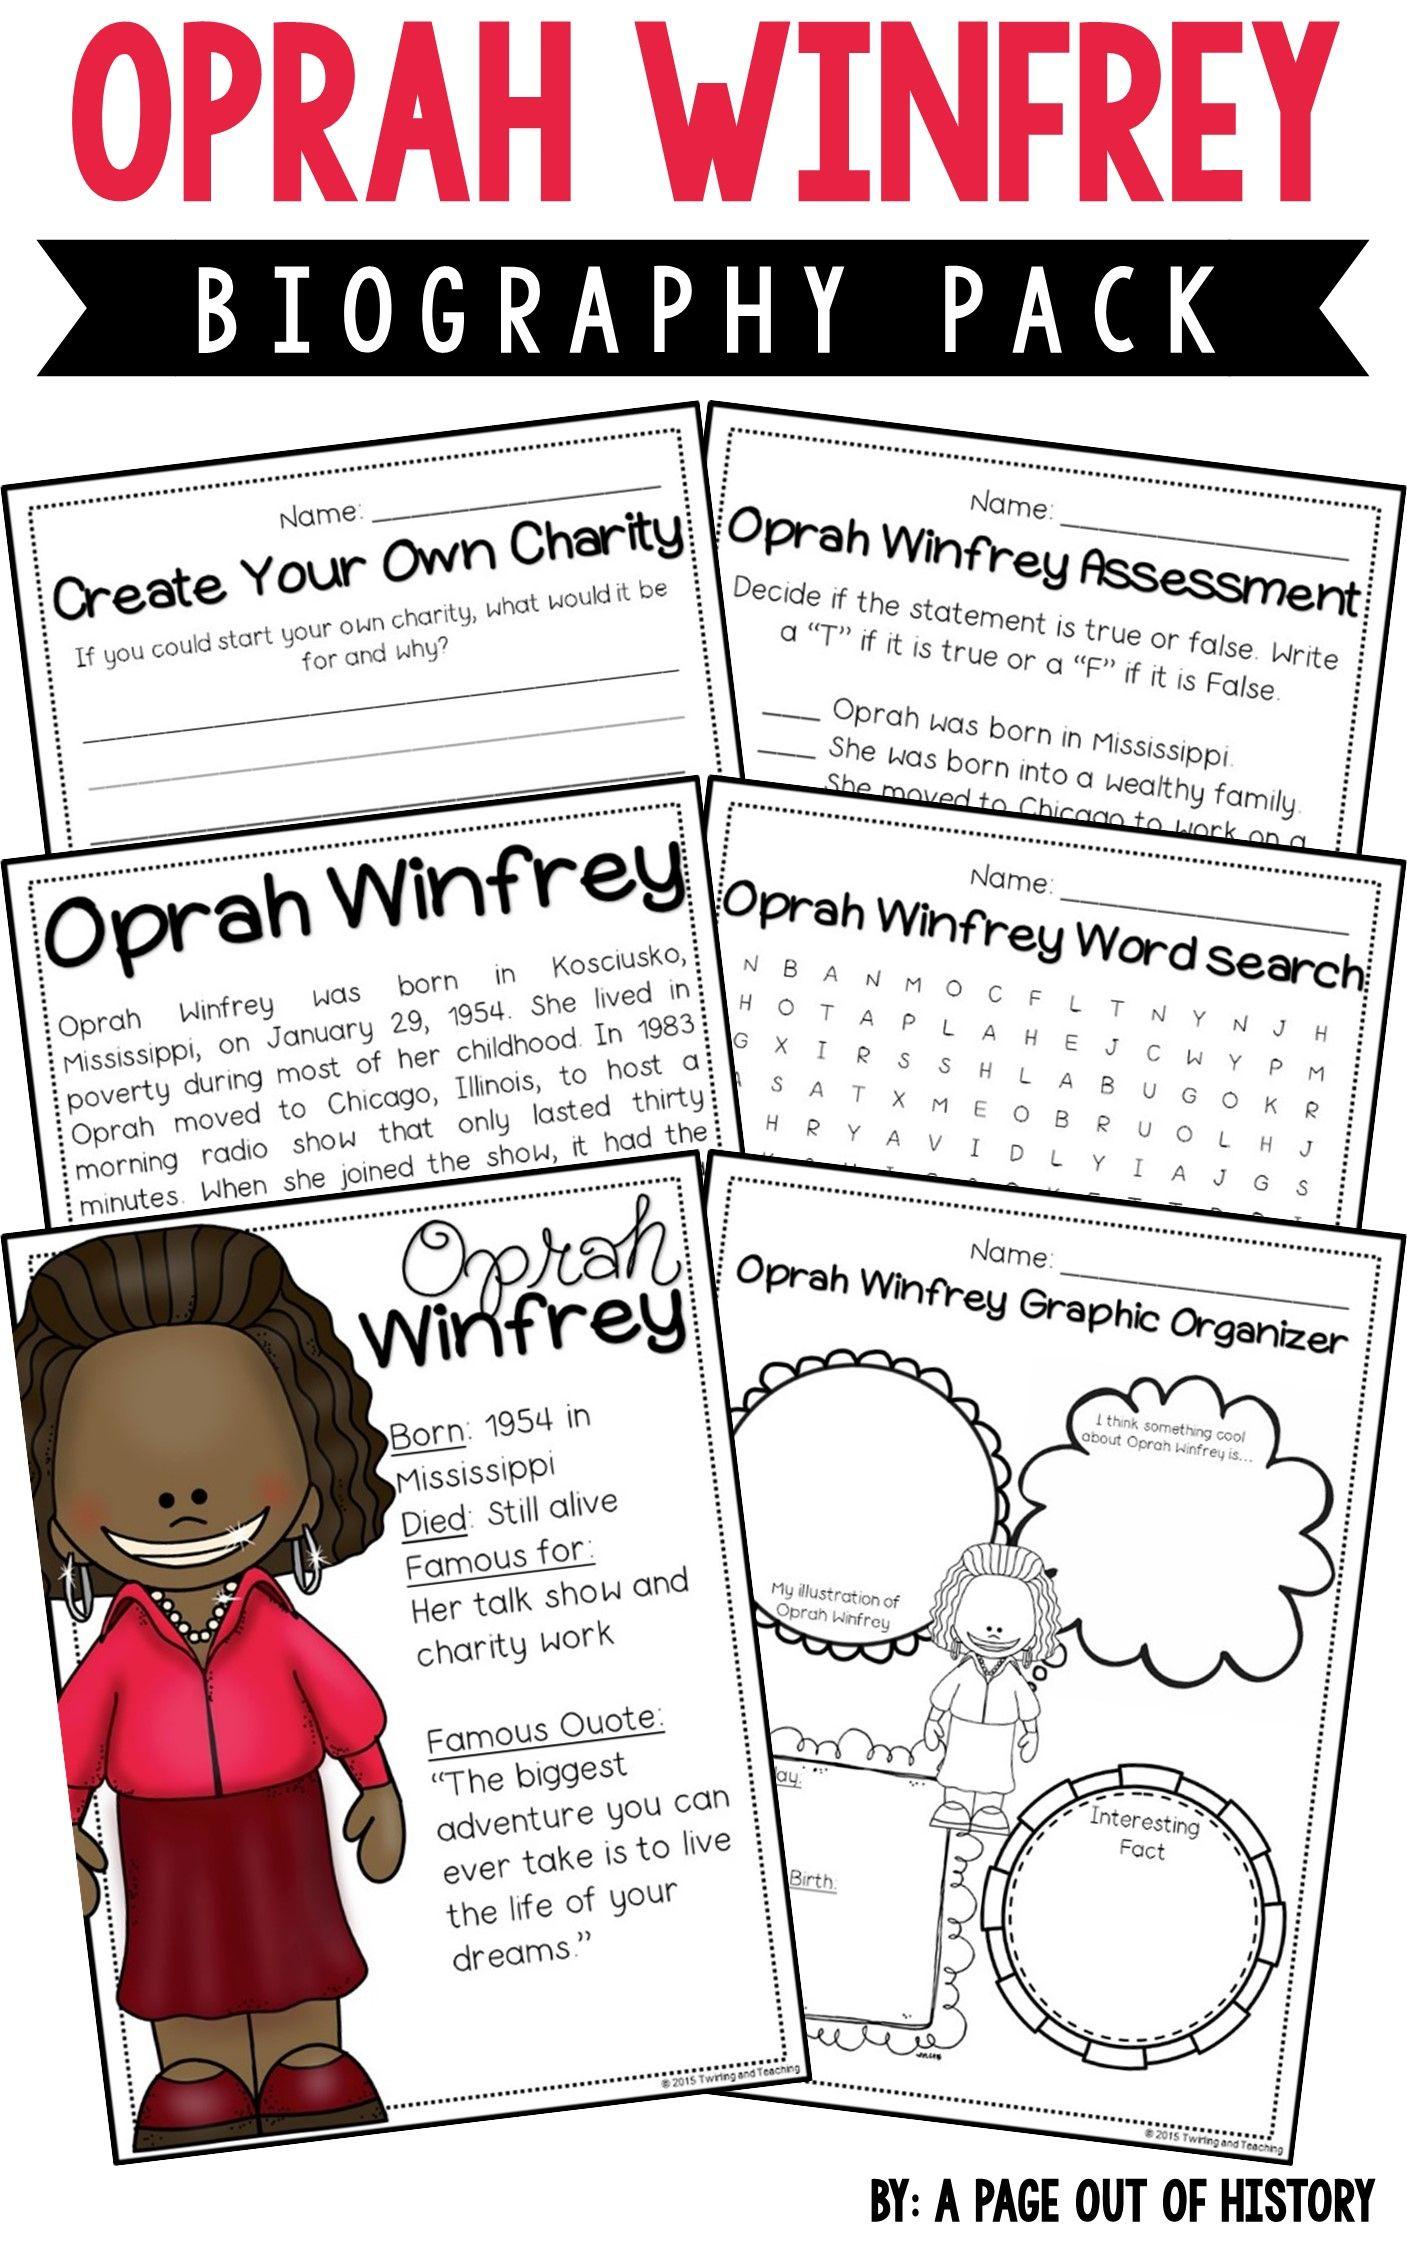 Oprah Winfrey Biography Pack